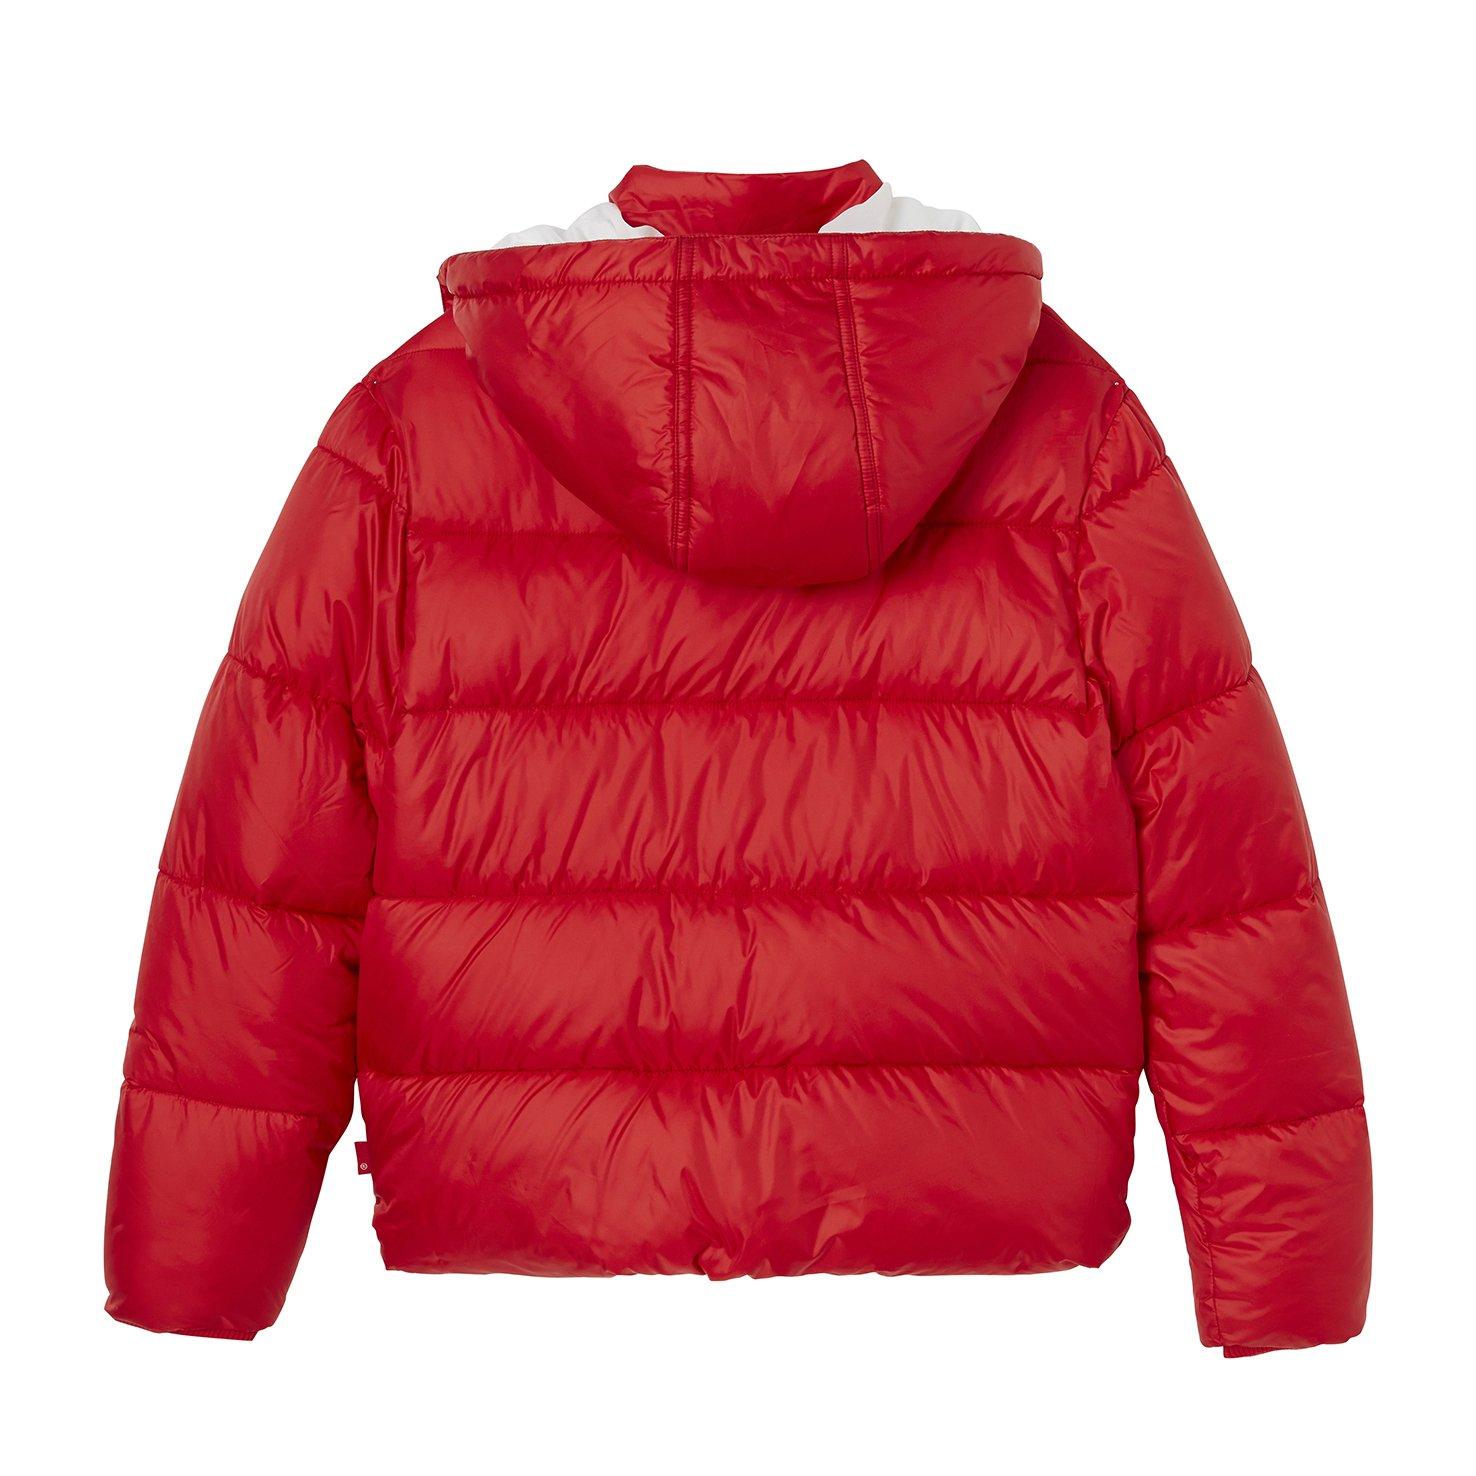 405a425026b7 Levi s Kids Girl s Raincoat NM41517 (Dark Red 37)  Amazon.co.uk  Clothing